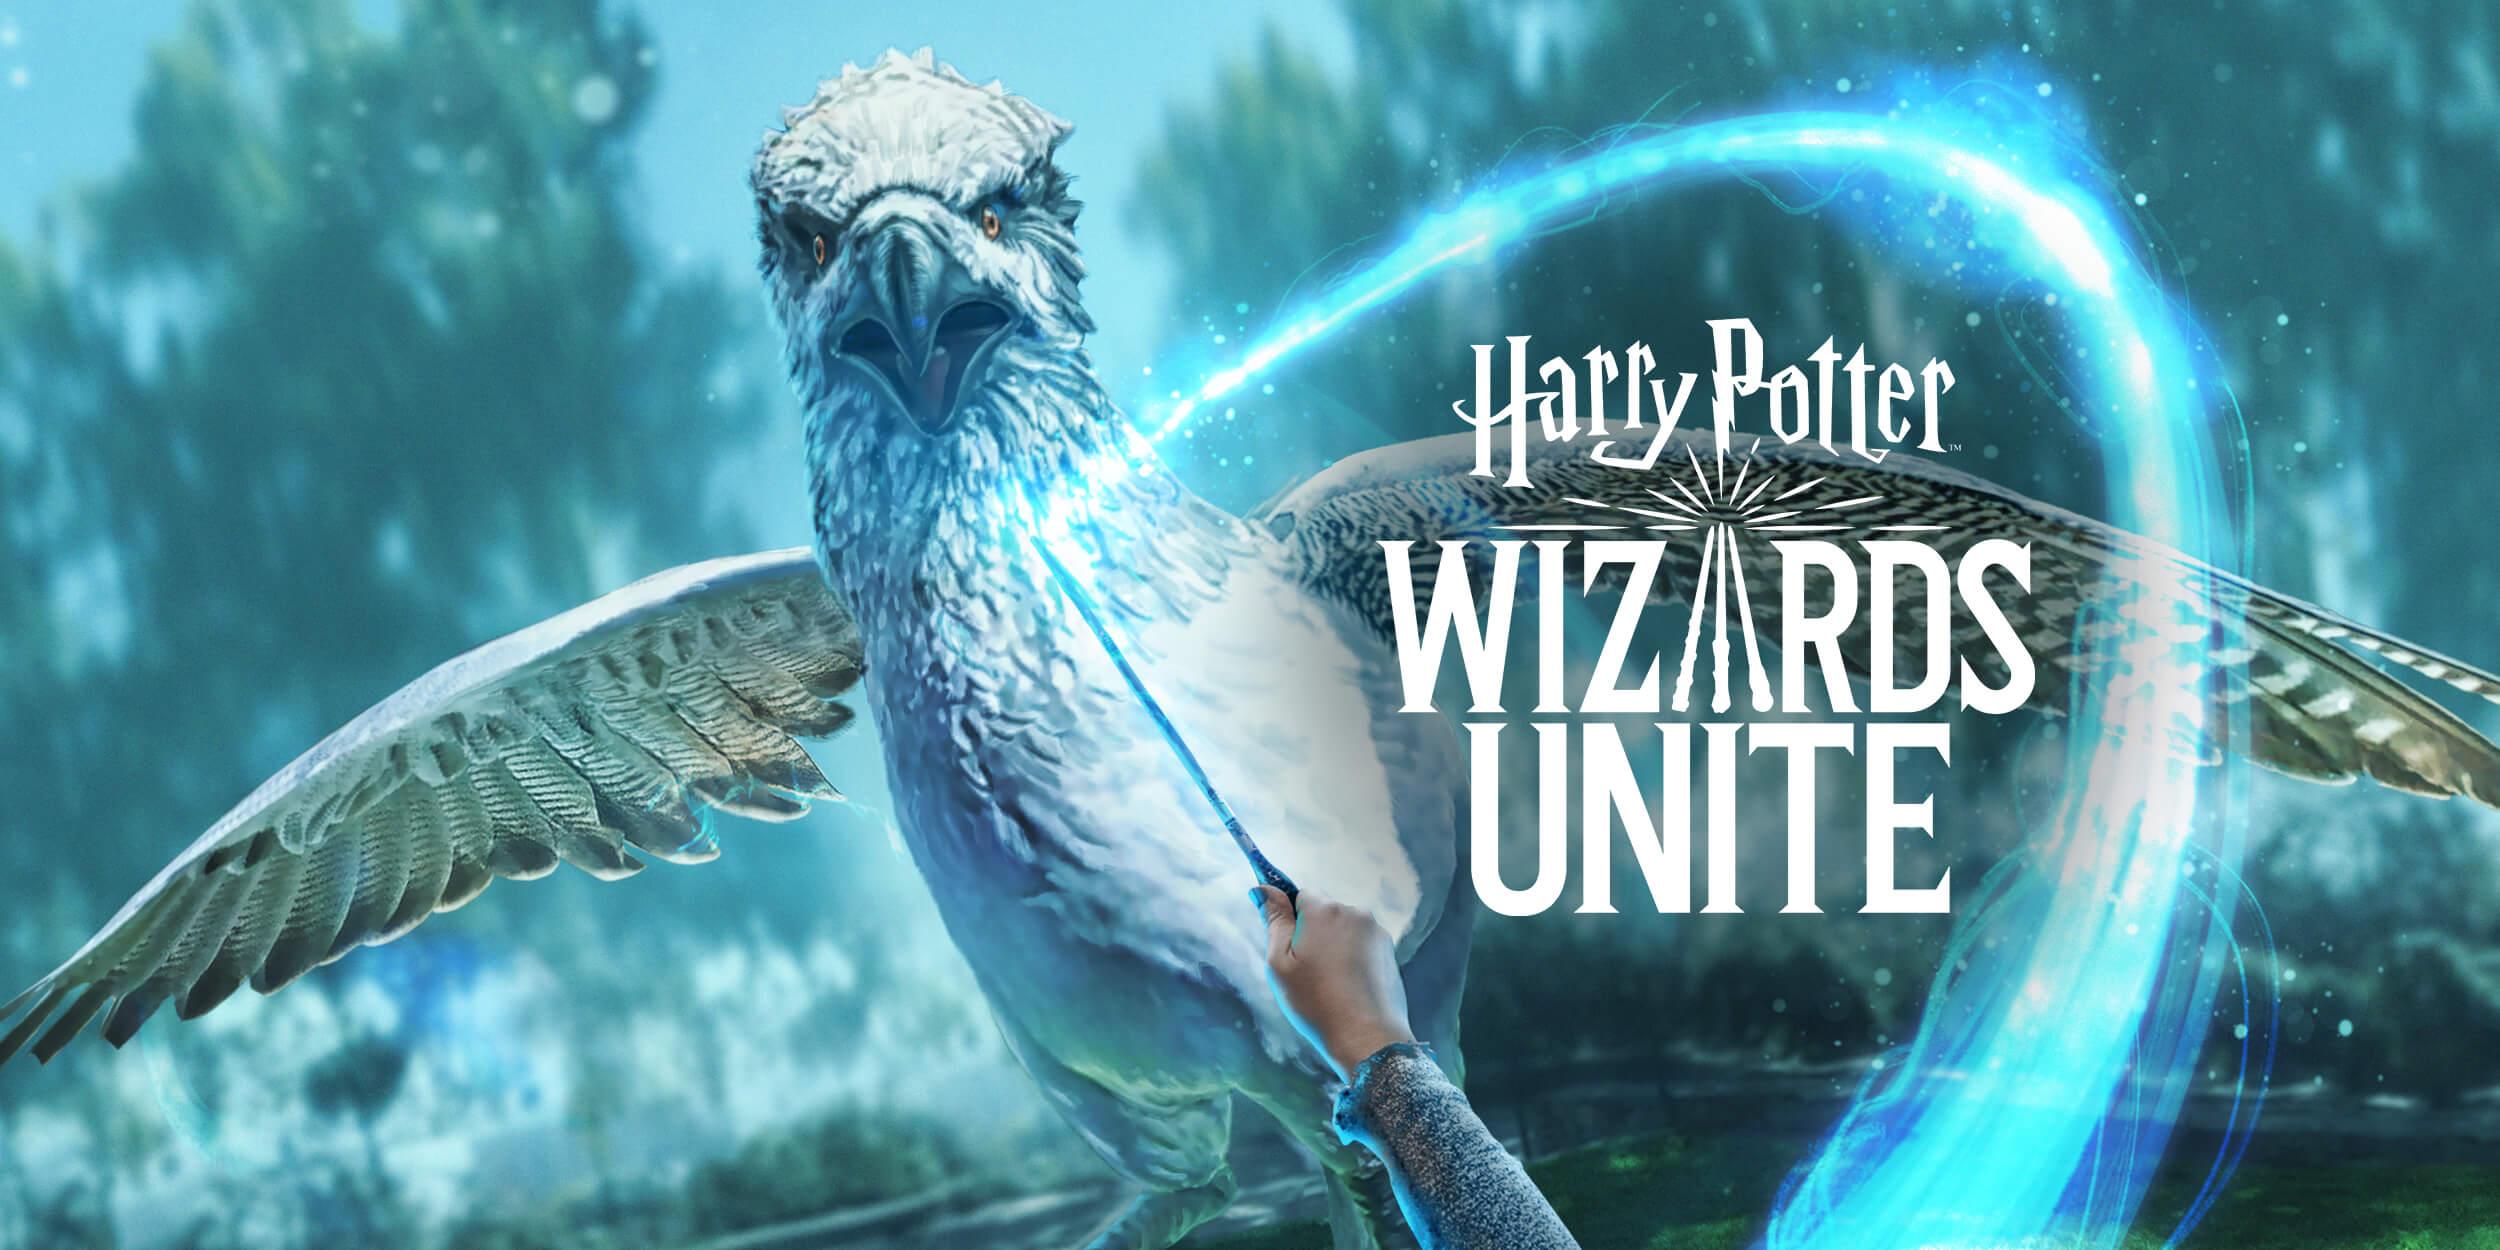 Harry Potter: Wizards Unite เปิดตัว $1.1 ล้าน แต่ยังห่างไกลจาก Pokemon GO